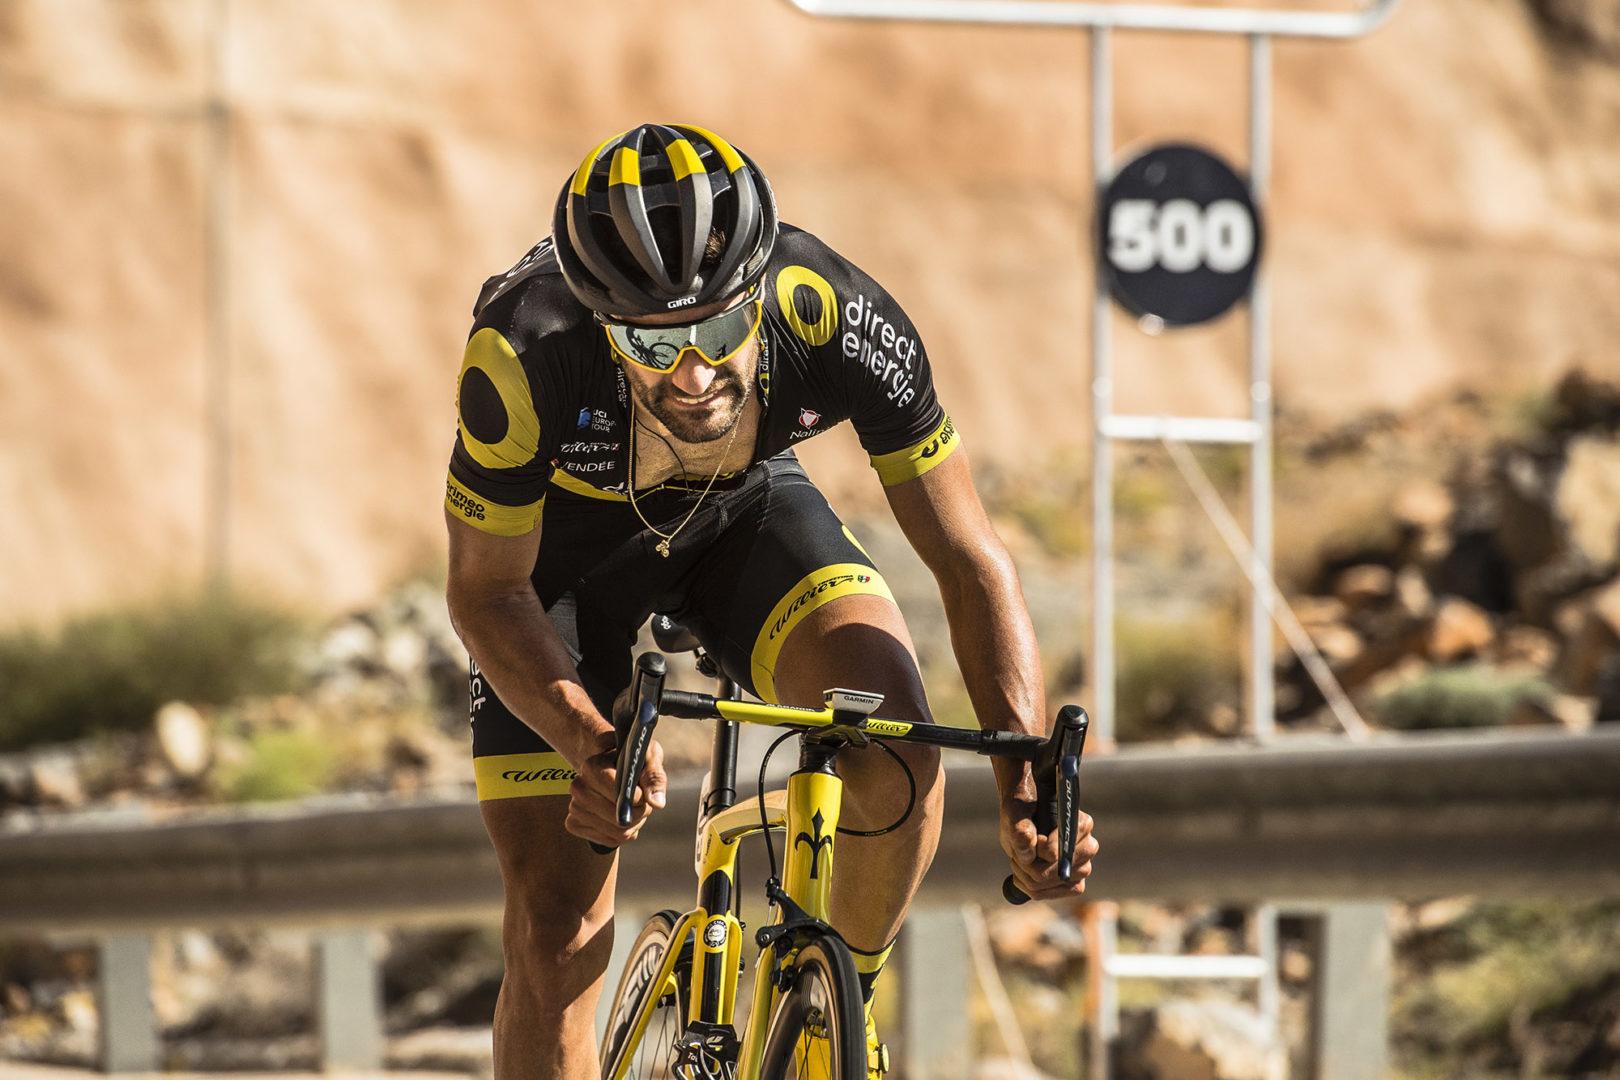 20/02/2019 - Tour of Oman - Stage 5 - Samayil - Jabal Al Akhdhar (Green Mountain) - Fabien Grellier (Direct Energie). Credit: ASO/Kare Dehlie Thorstad